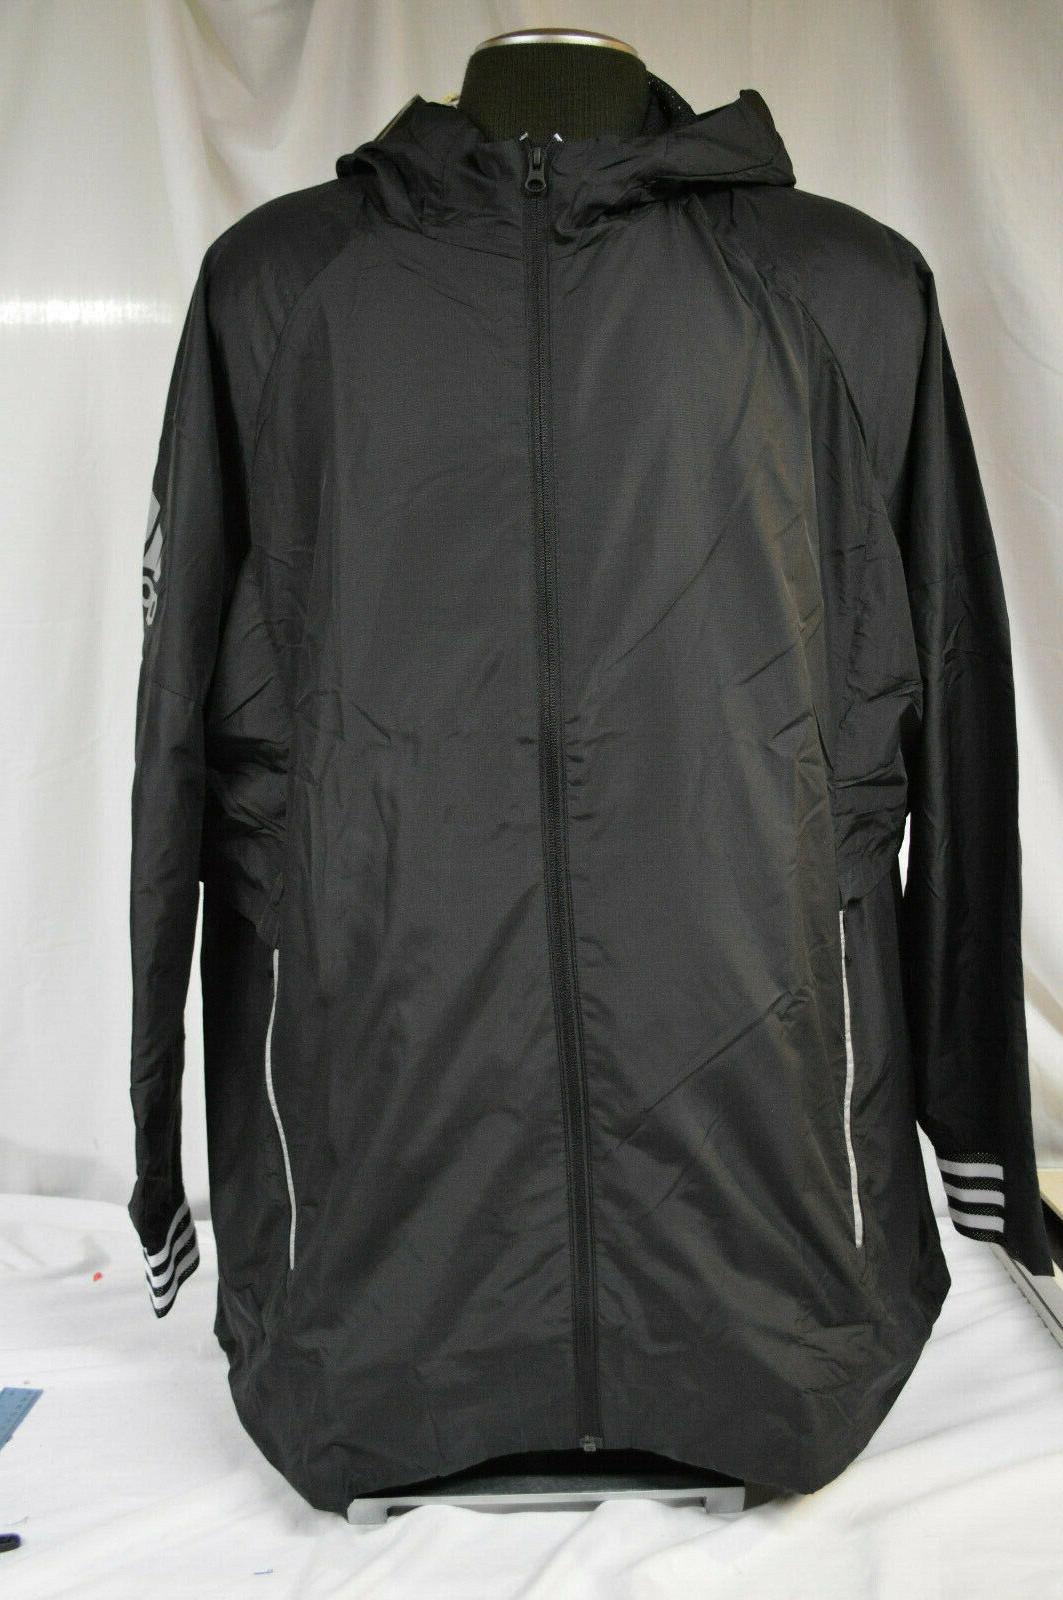 Adidas Black Hooded Windbreaker Reflective